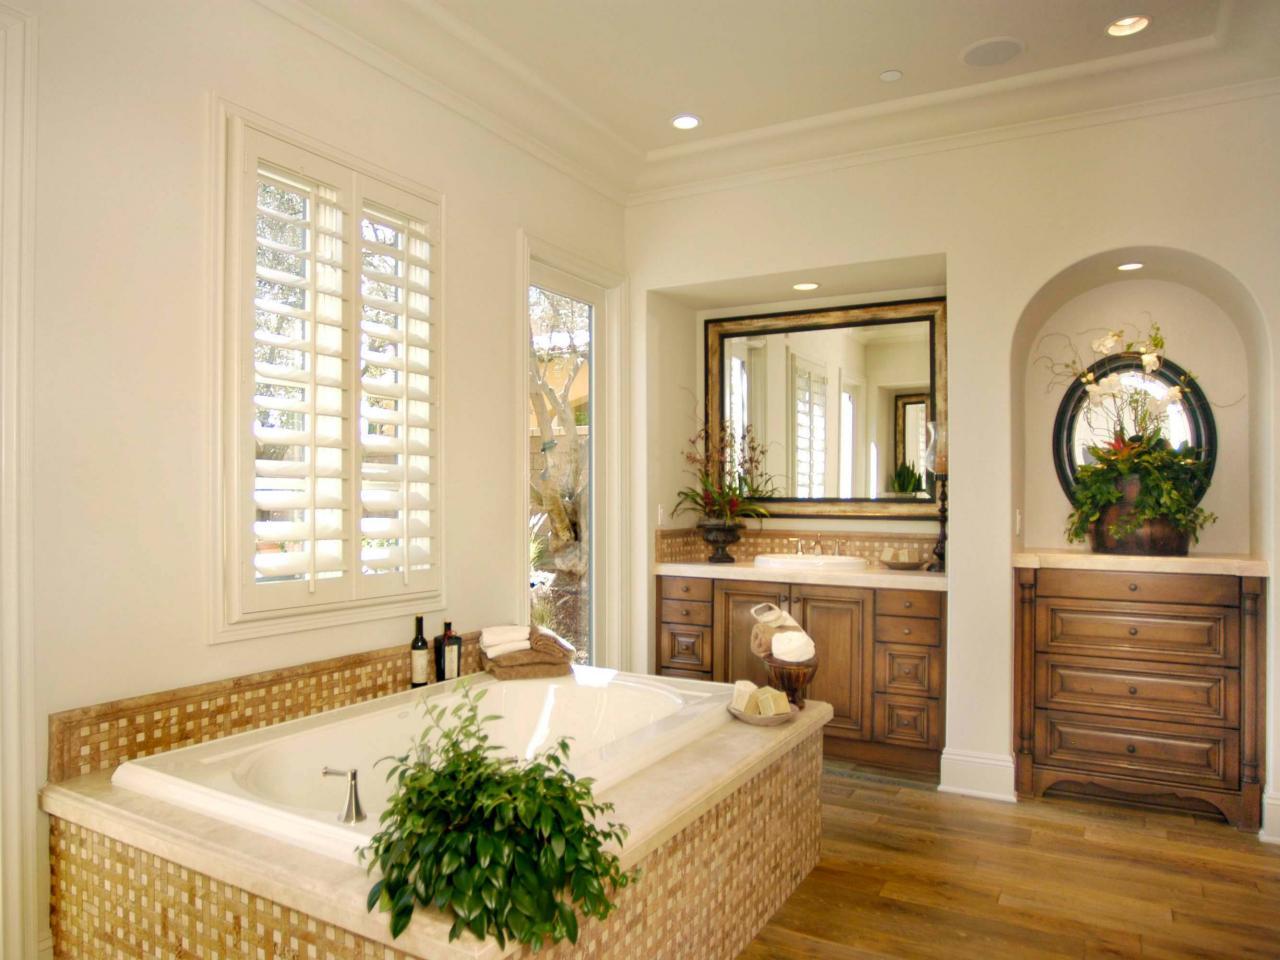 Photos hgtv for Bathrooms in style